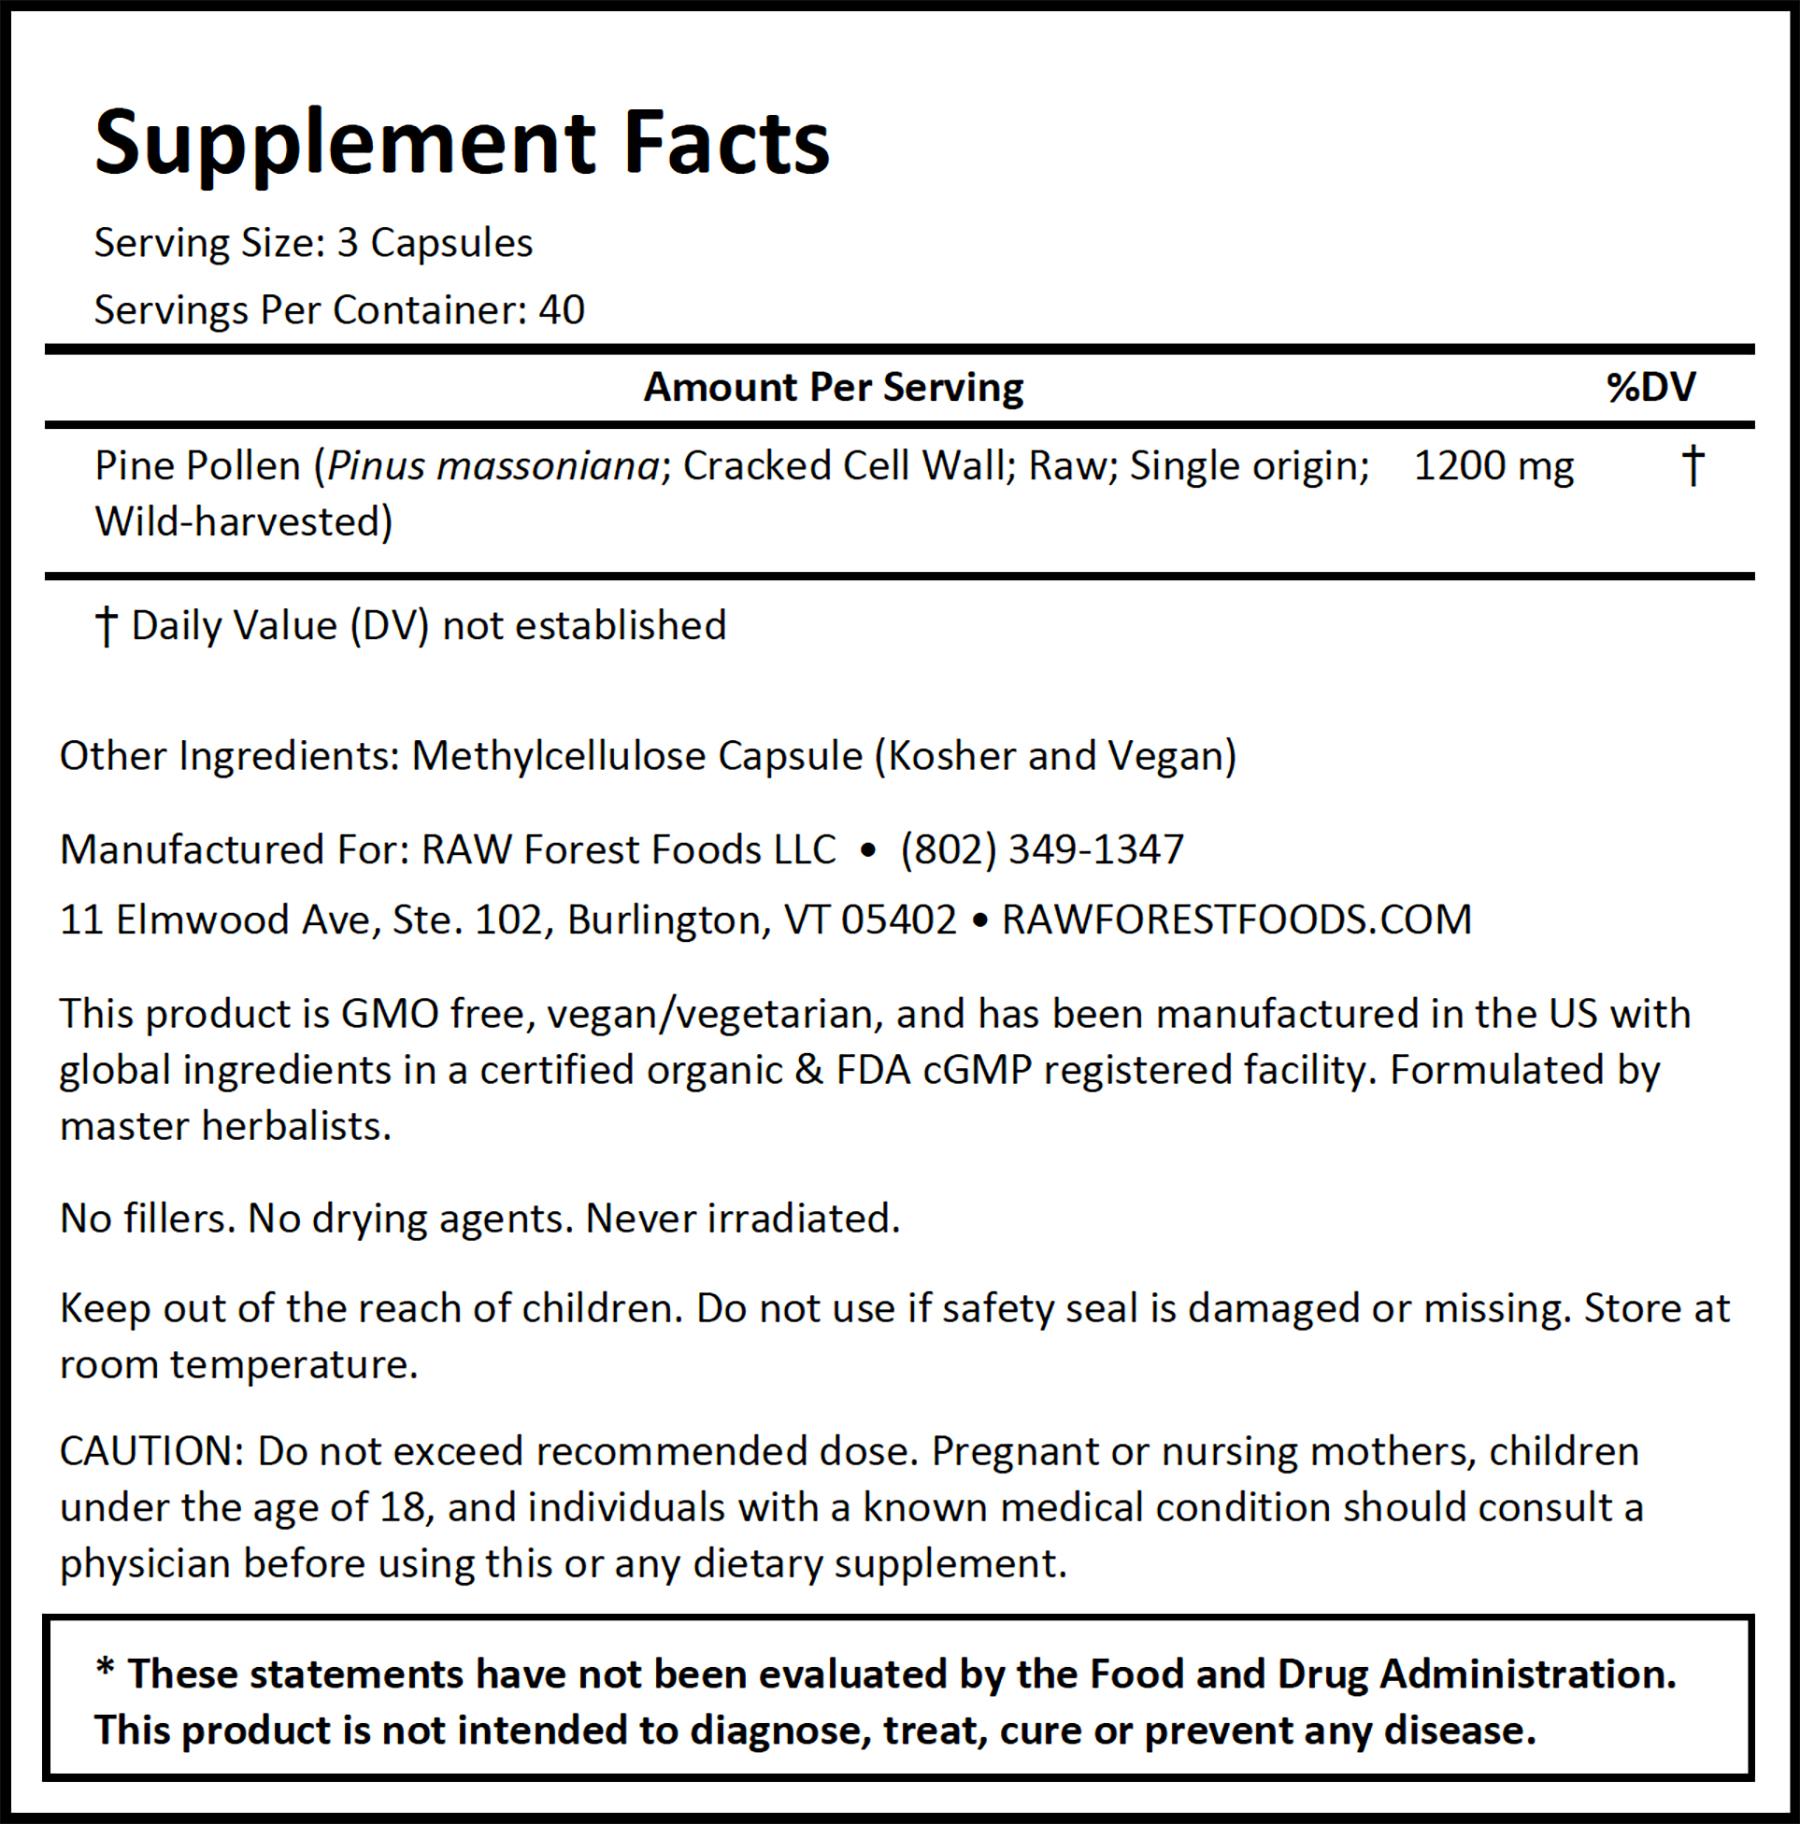 raw-pine-pollen-capsules-supplement-facts.jpg